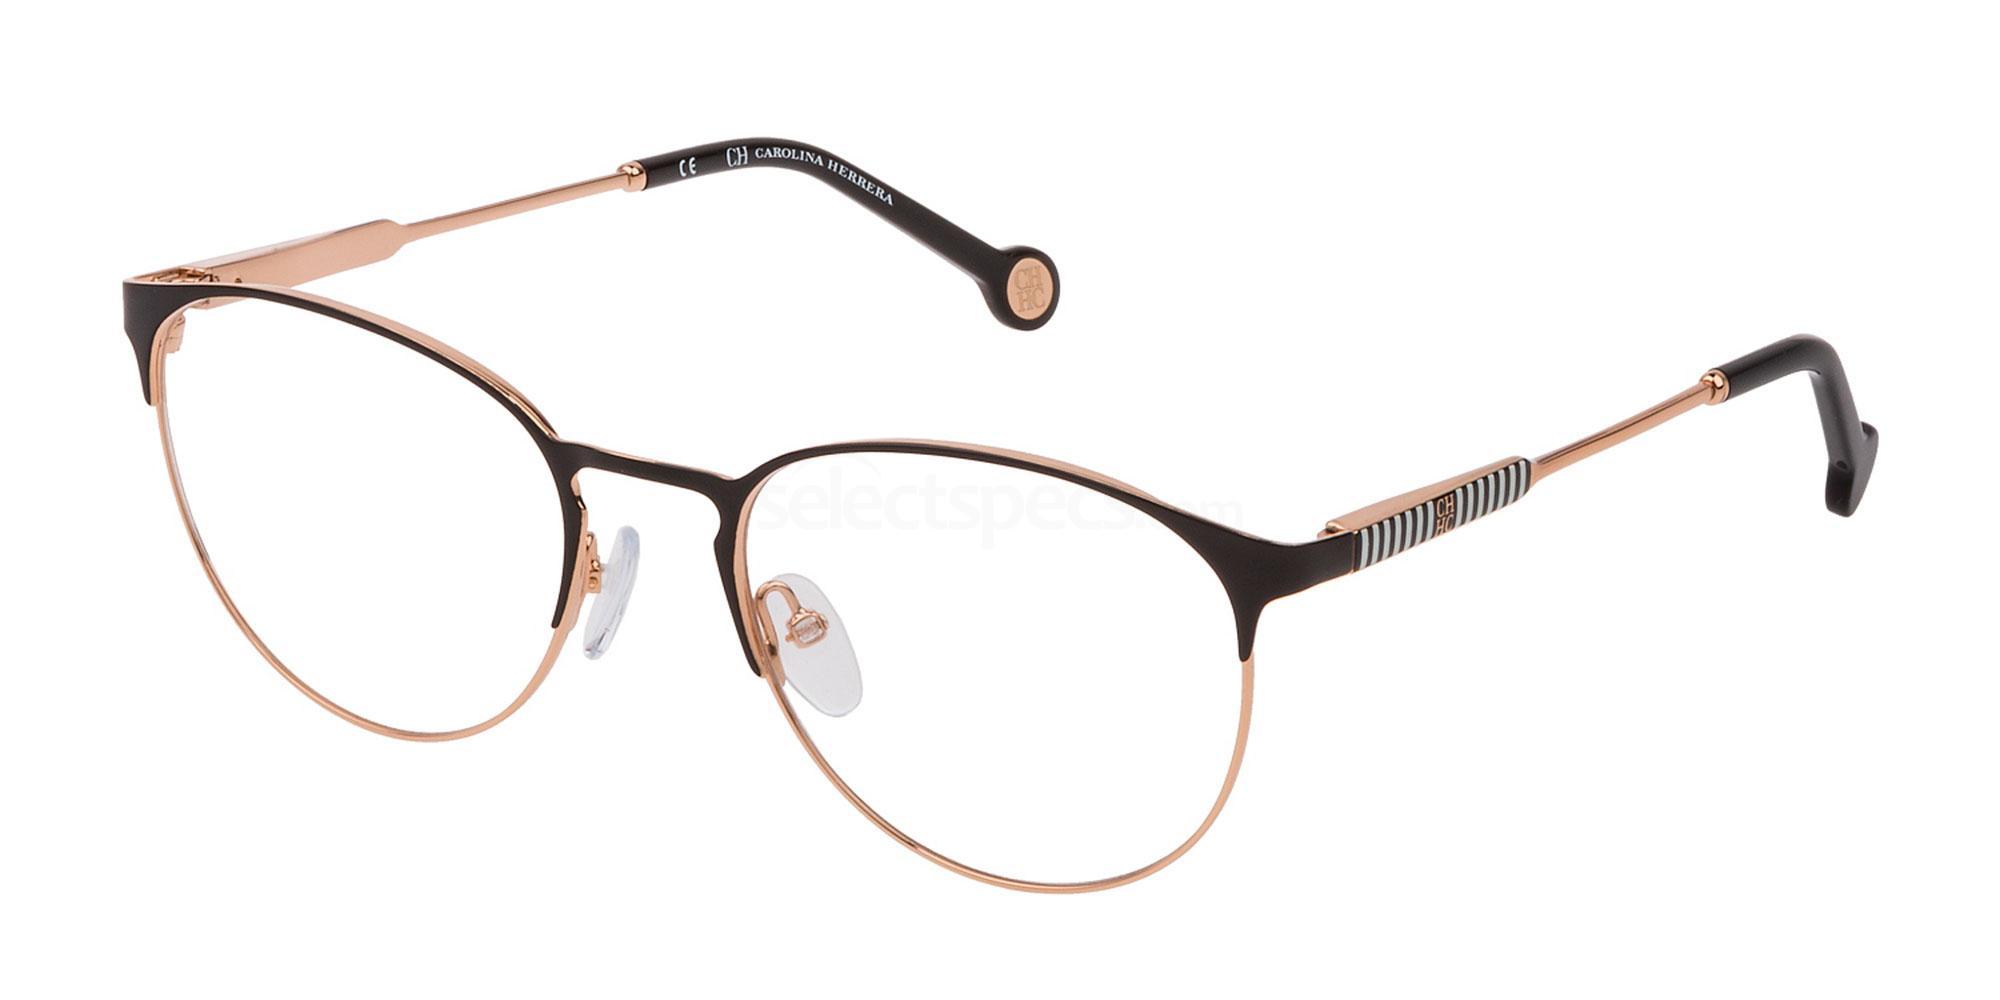 0301 VHE136 Glasses, CH Carolina Herrera